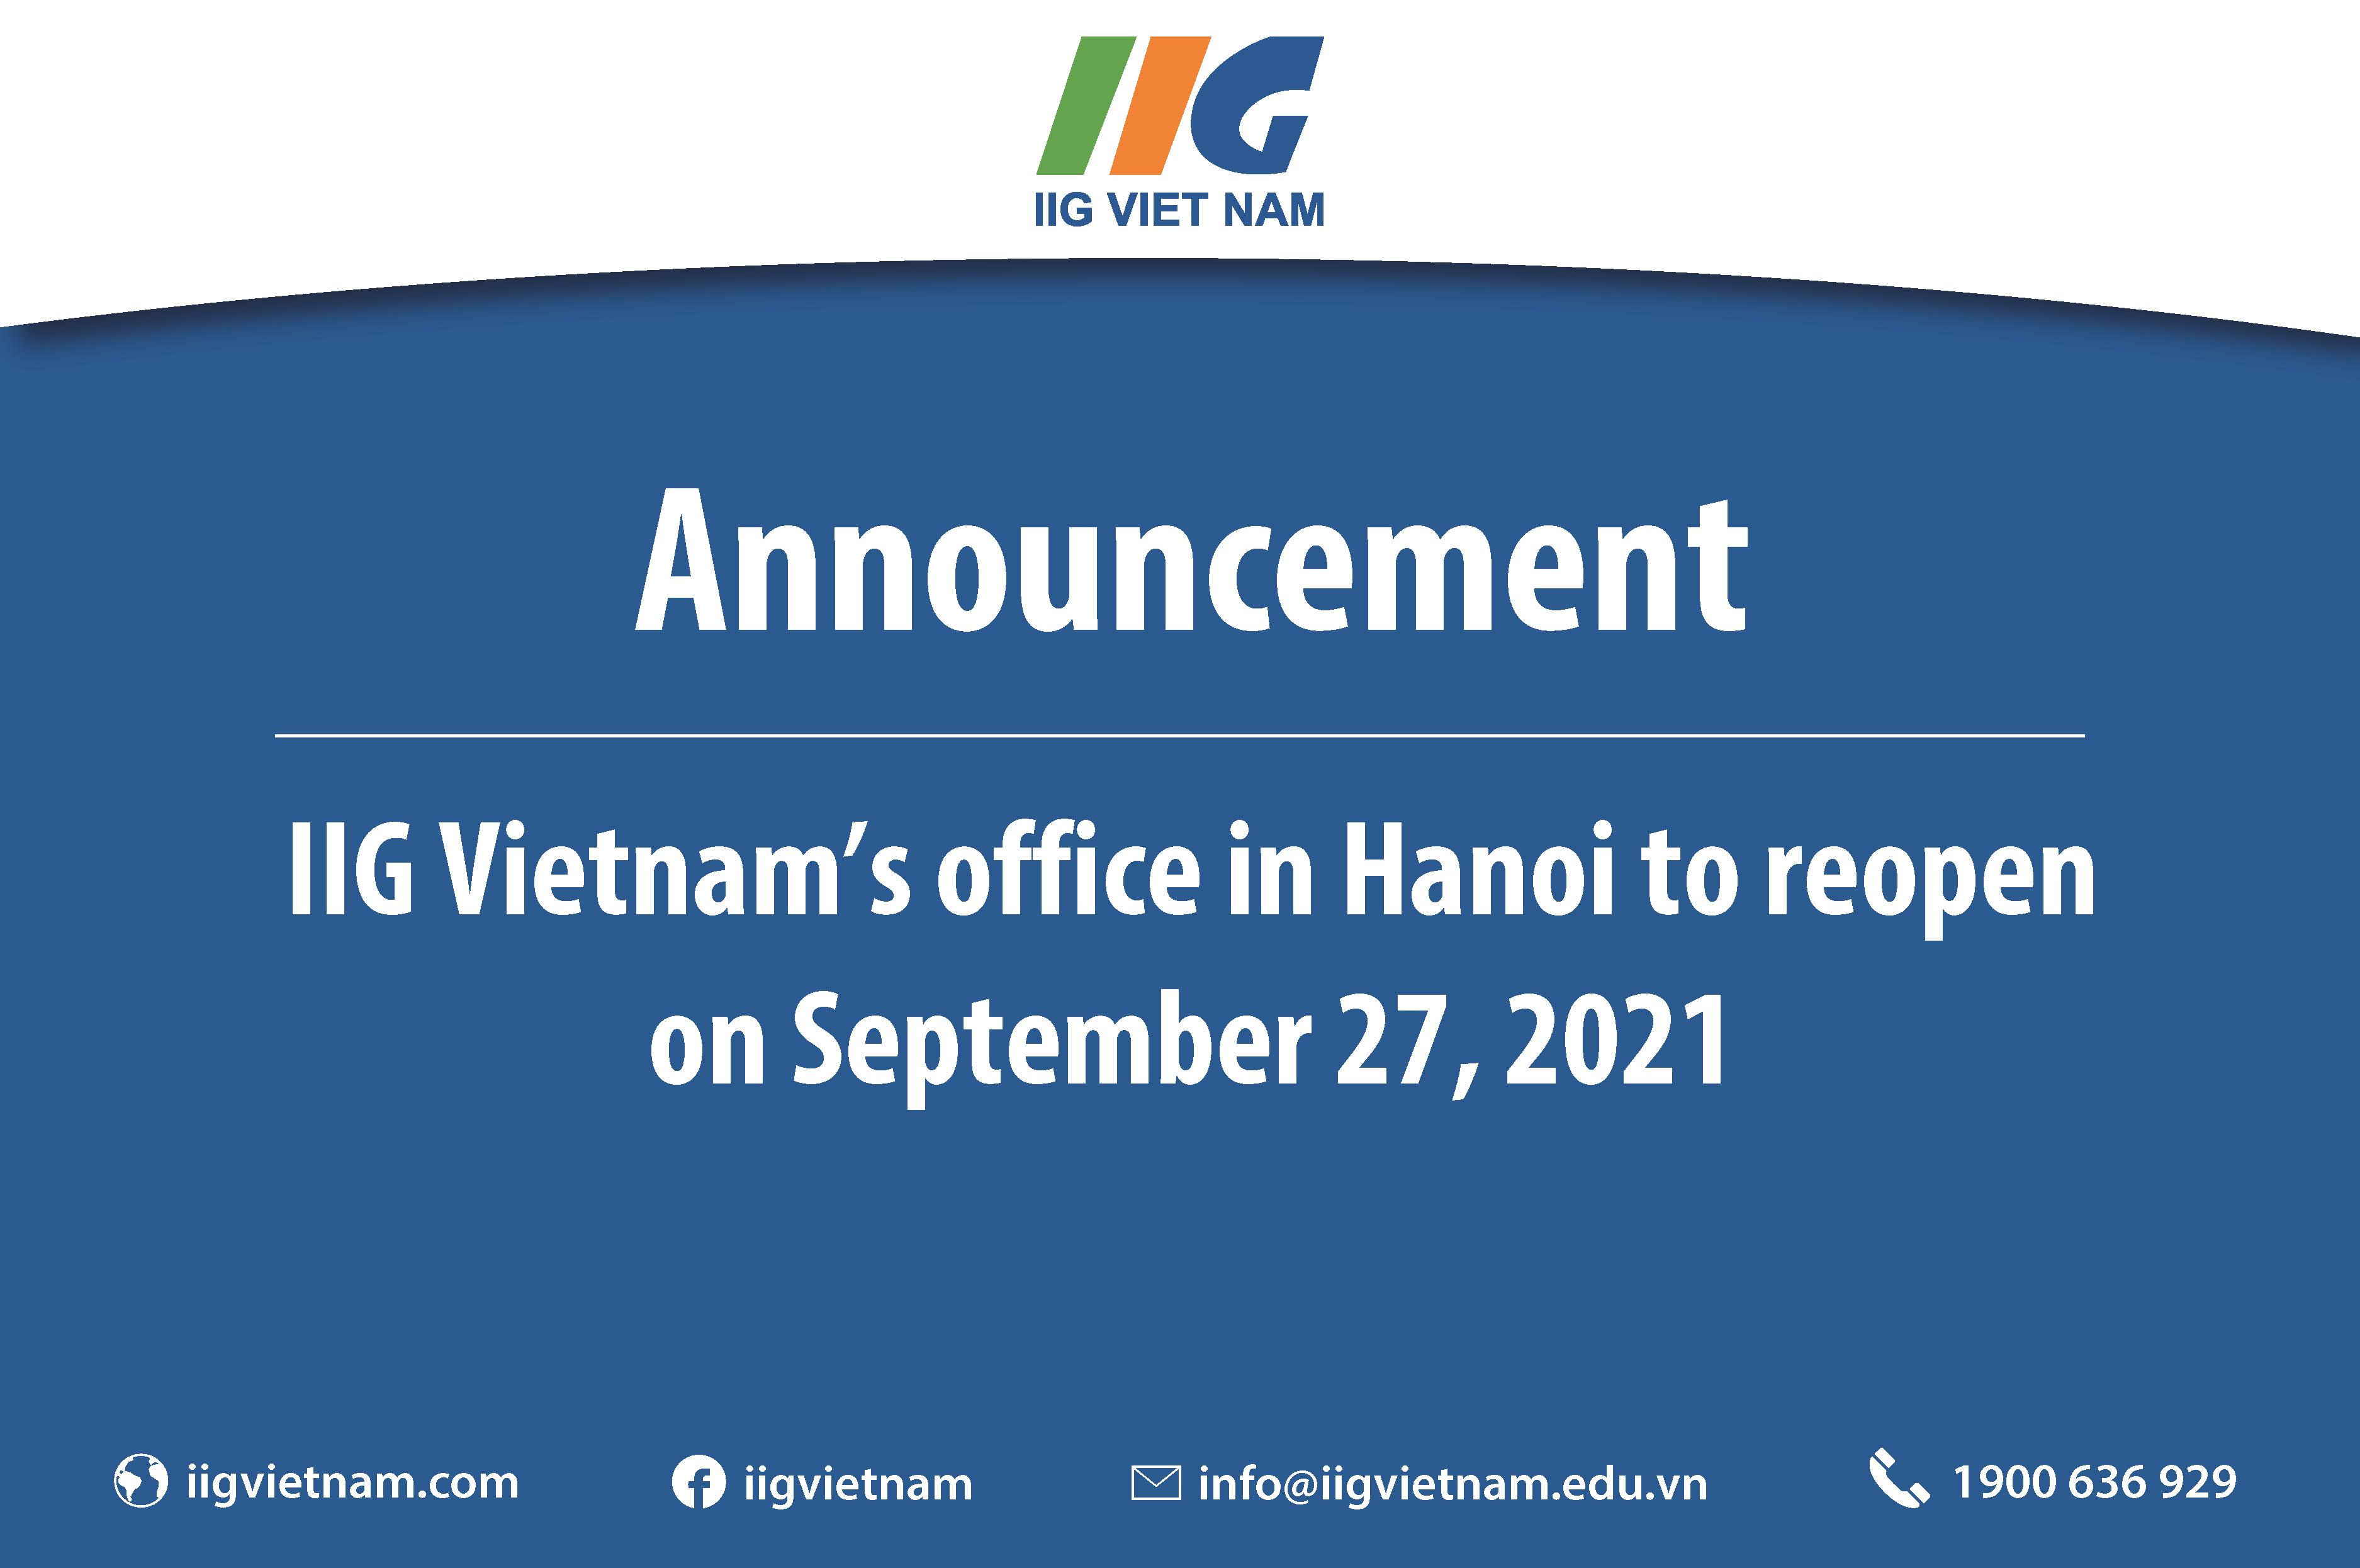 Announcement: IIG Vietnam's office in Hanoi to reopen on September 27, 2021